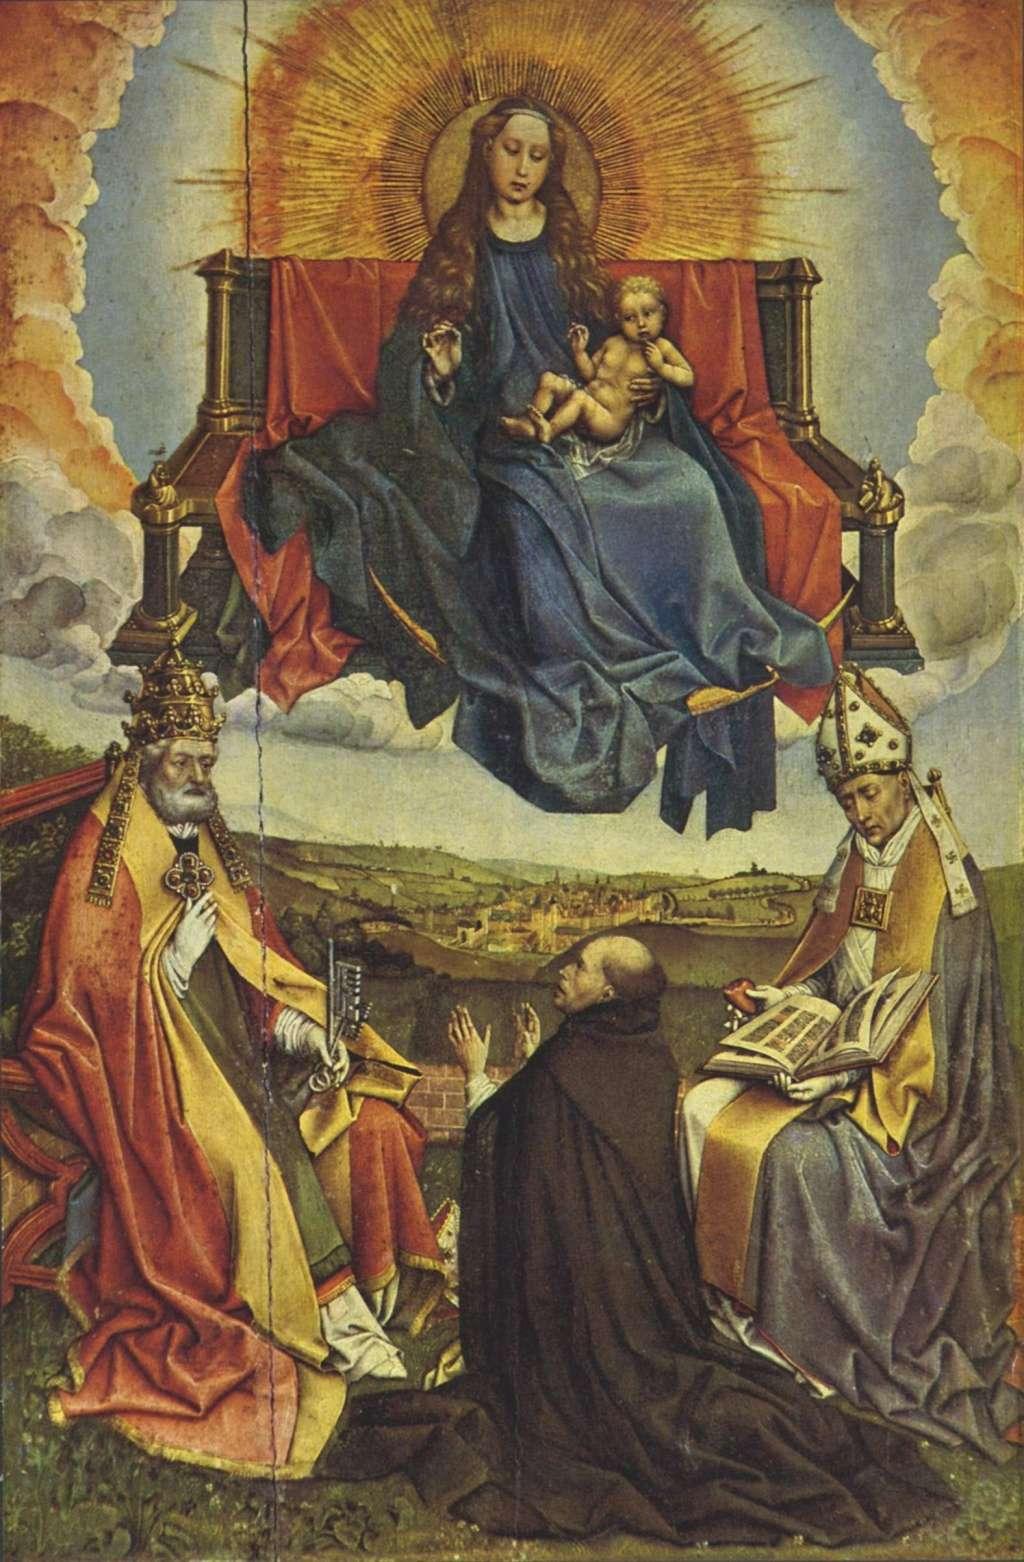 Les peintures religieuses de Robert Campin La_vie12